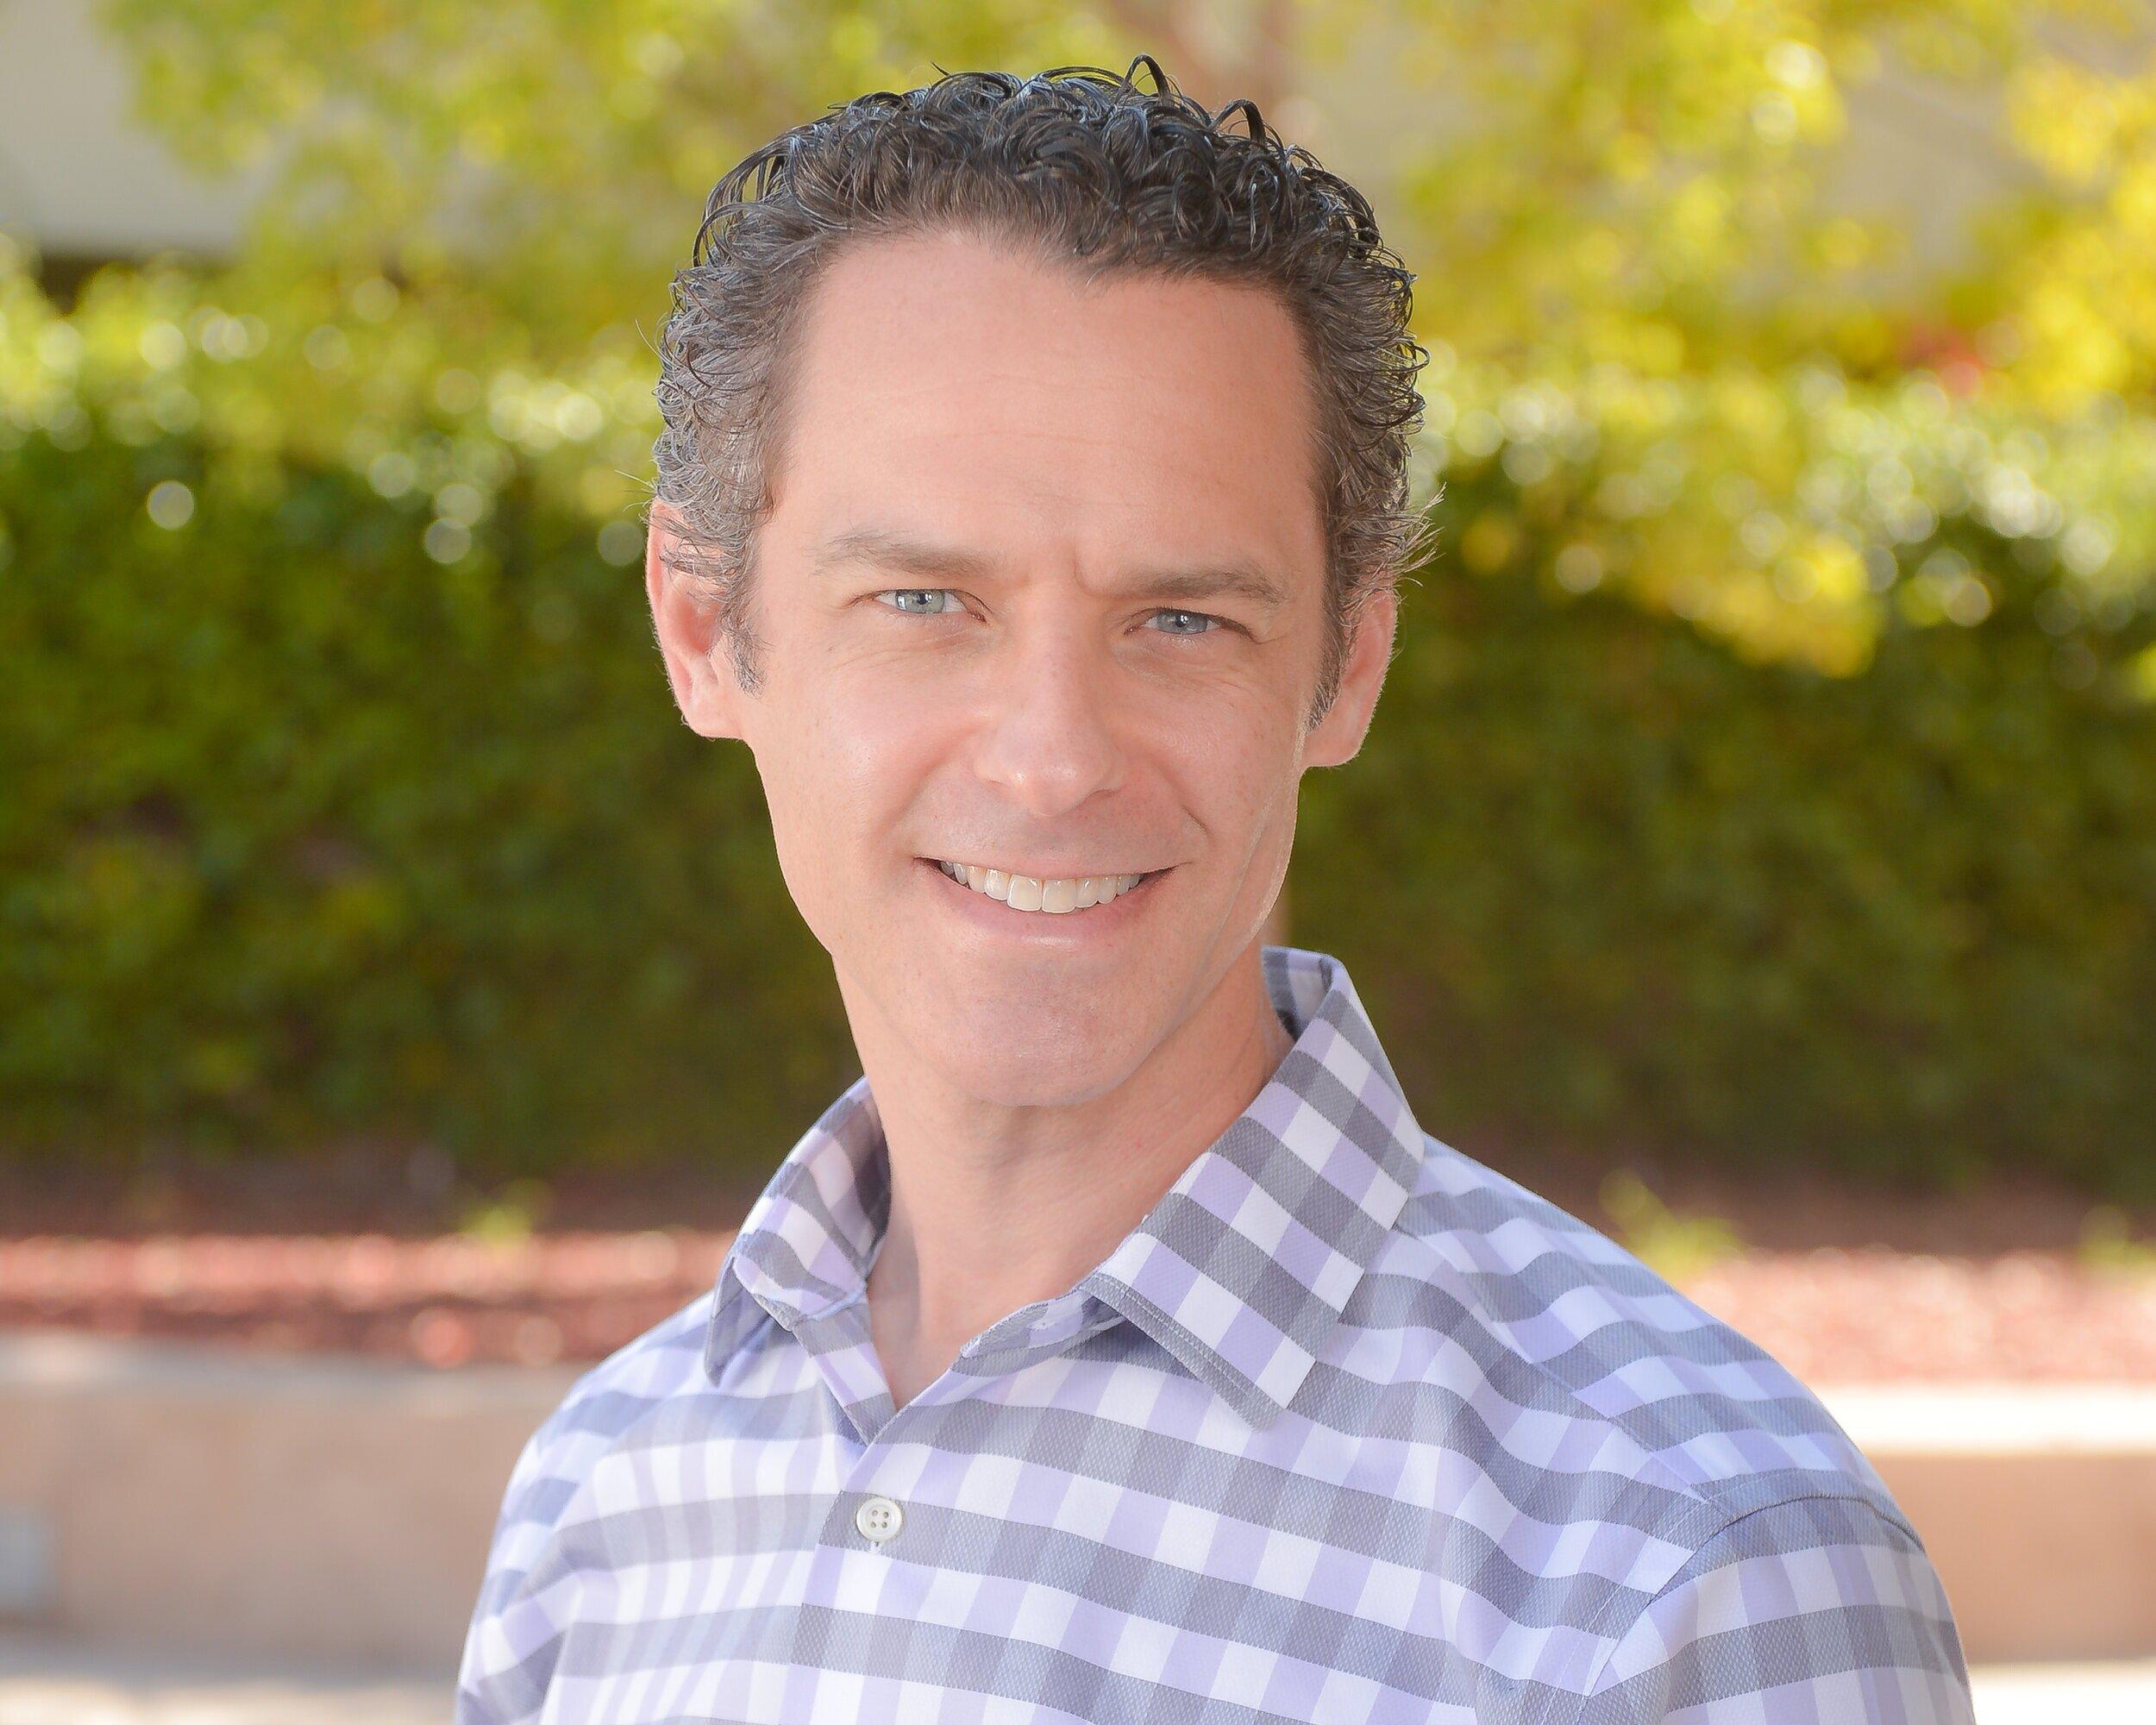 Dan Zagursky, BandwidthX战略和业务发展副总裁, Dan为董事会带来了无价的商业发展战略.